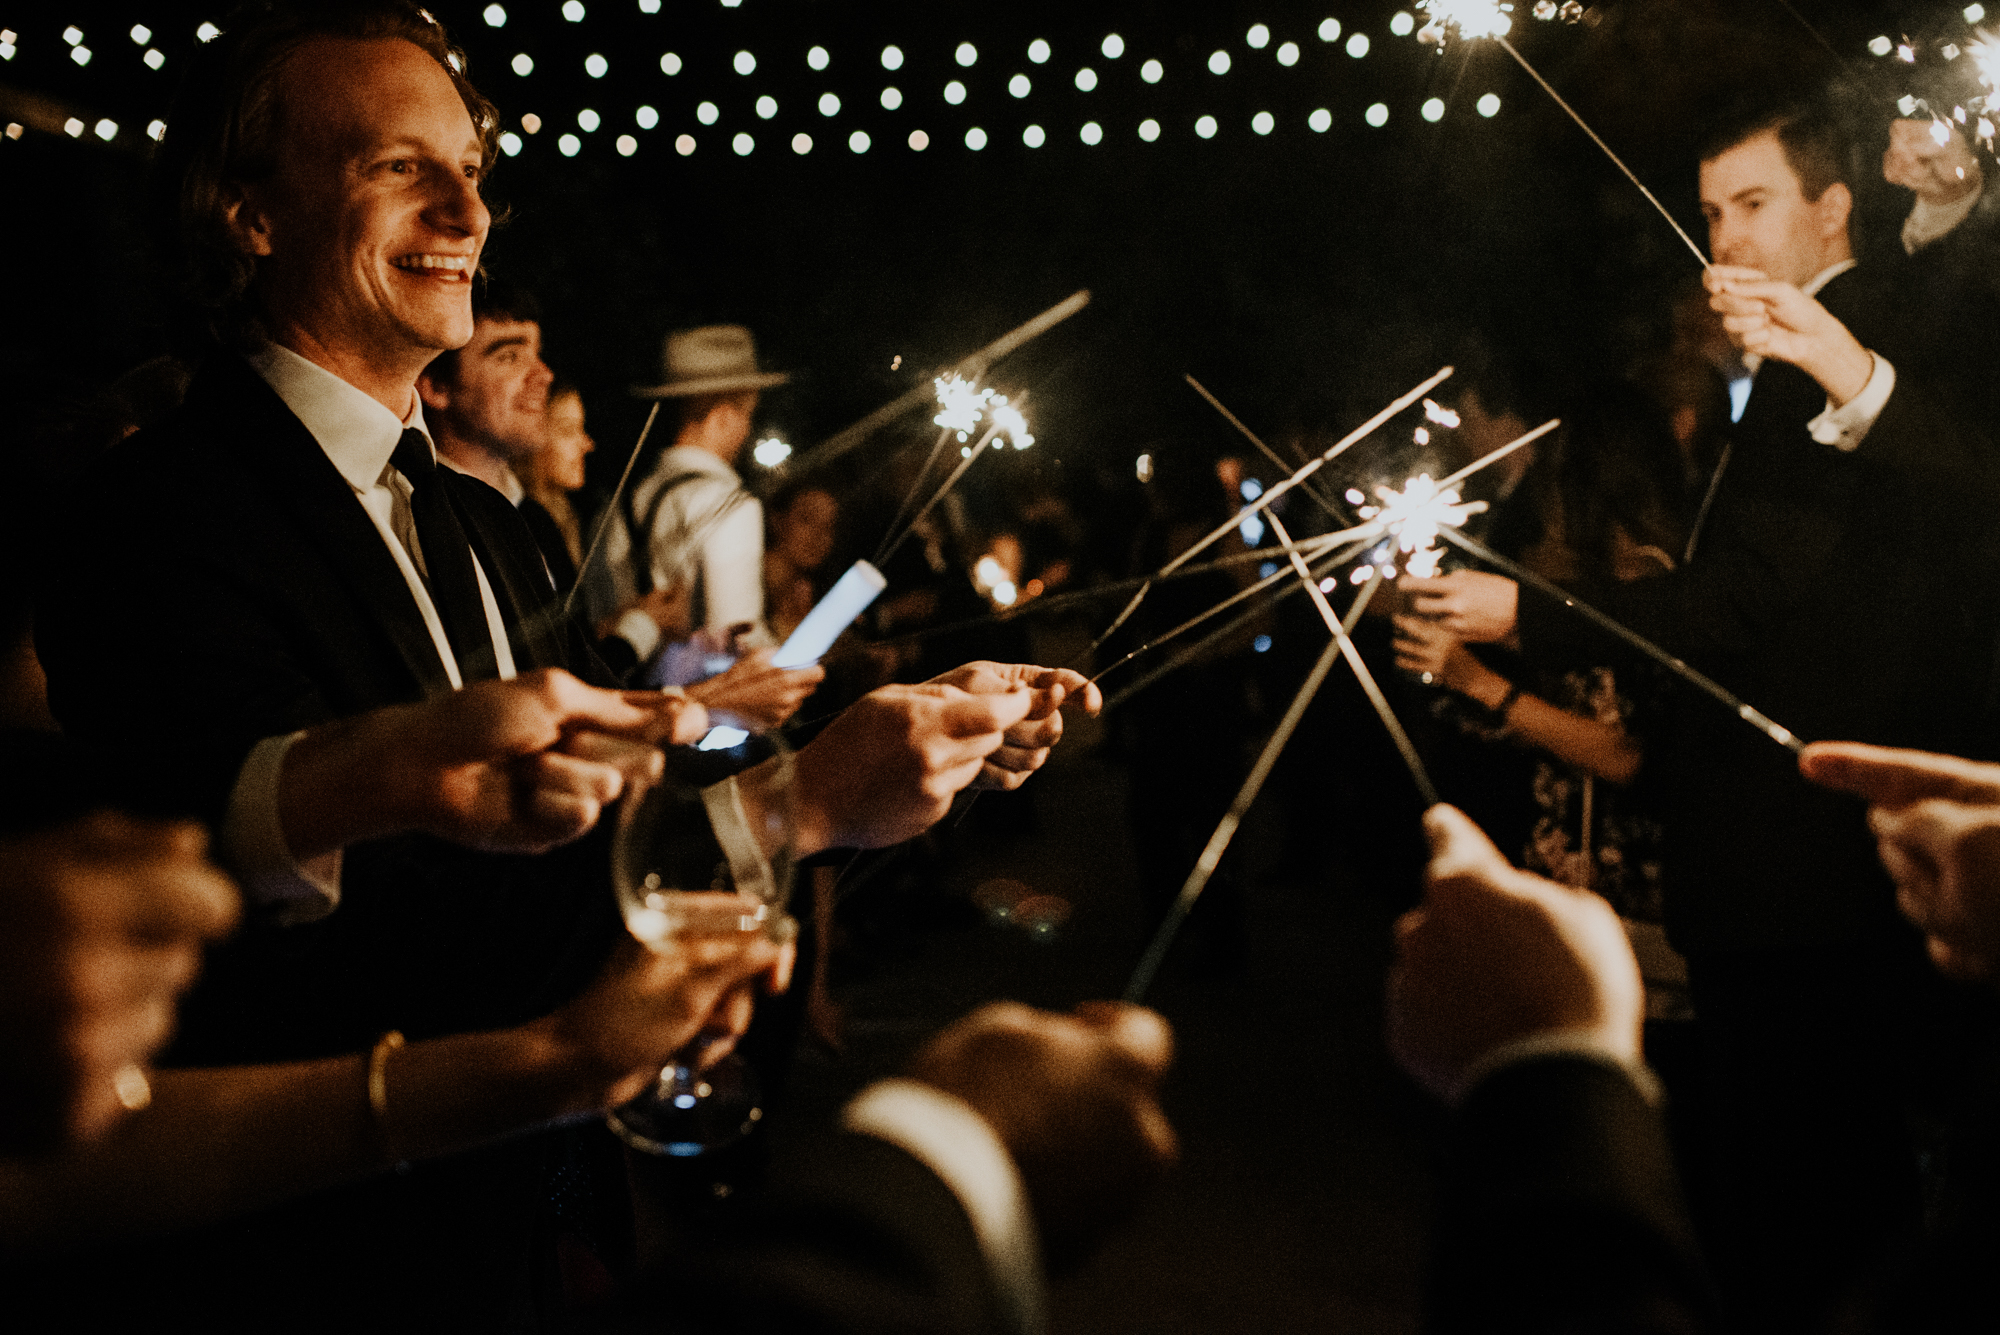 South Congress Hotel Wedding Fabulous Sparklers Exit Photos Austin, Texas